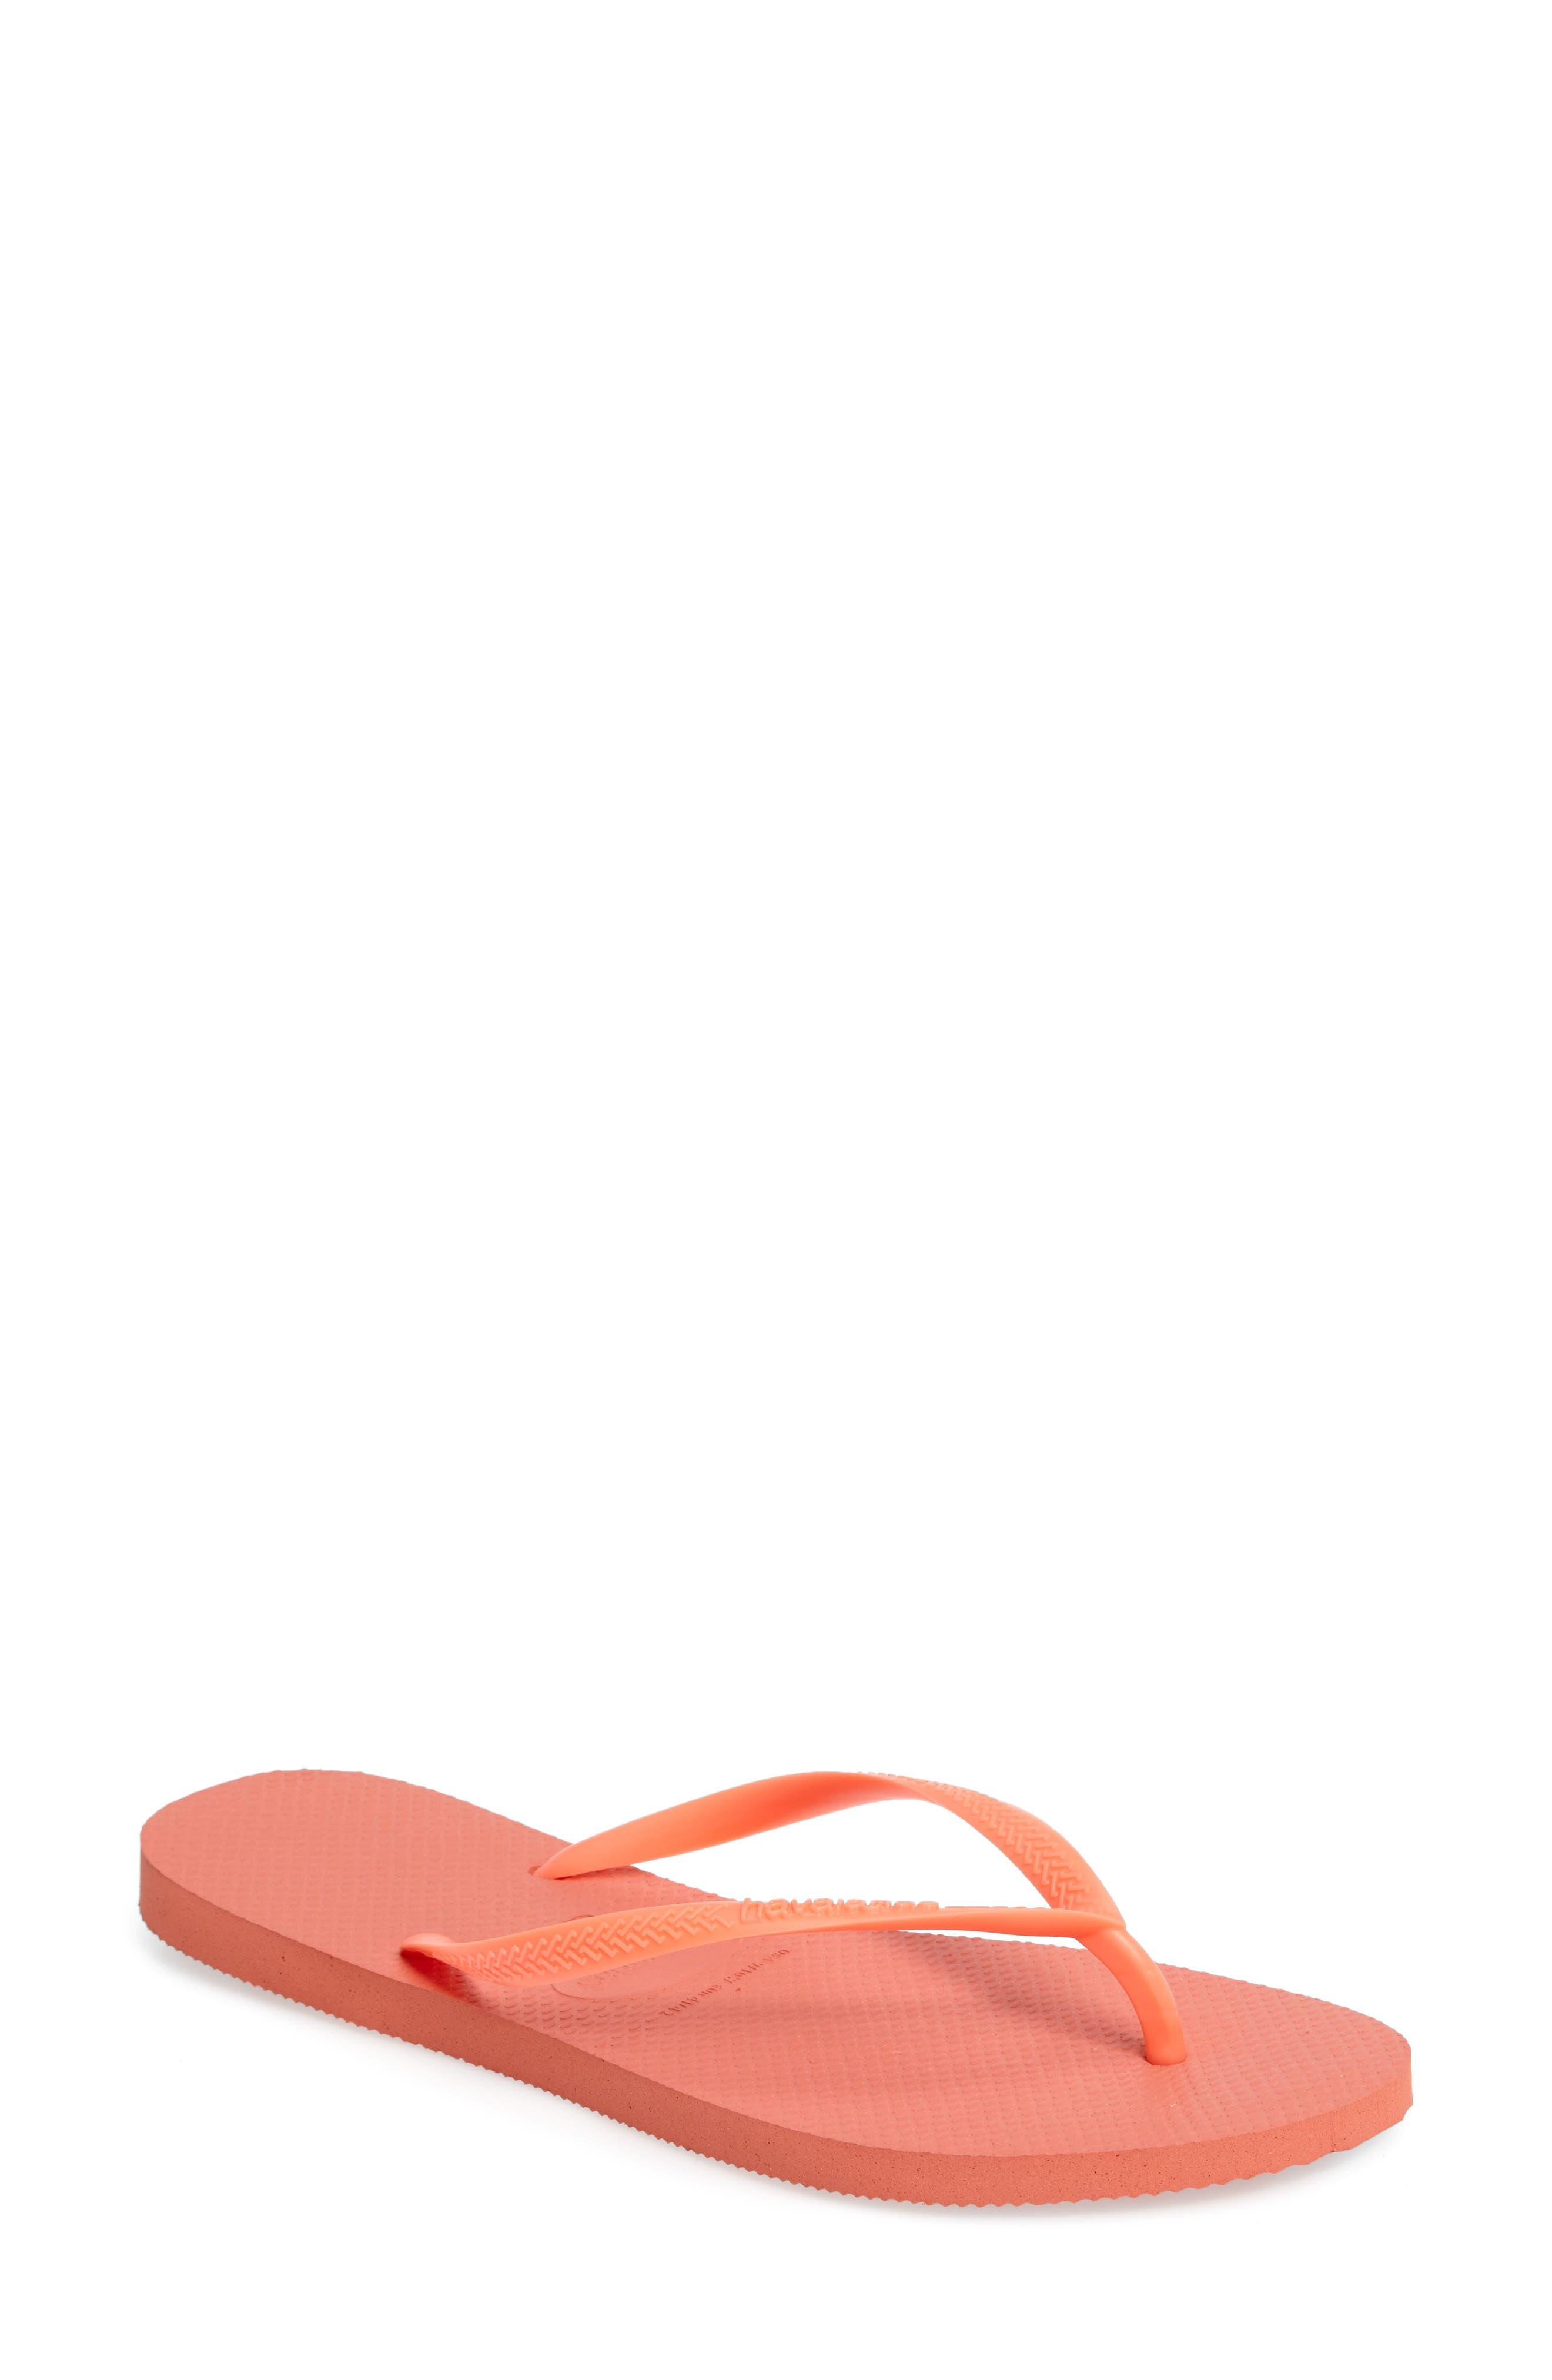 Alternate Image 1 Selected - Havaianas 'Slim' Flip Flop (Women)